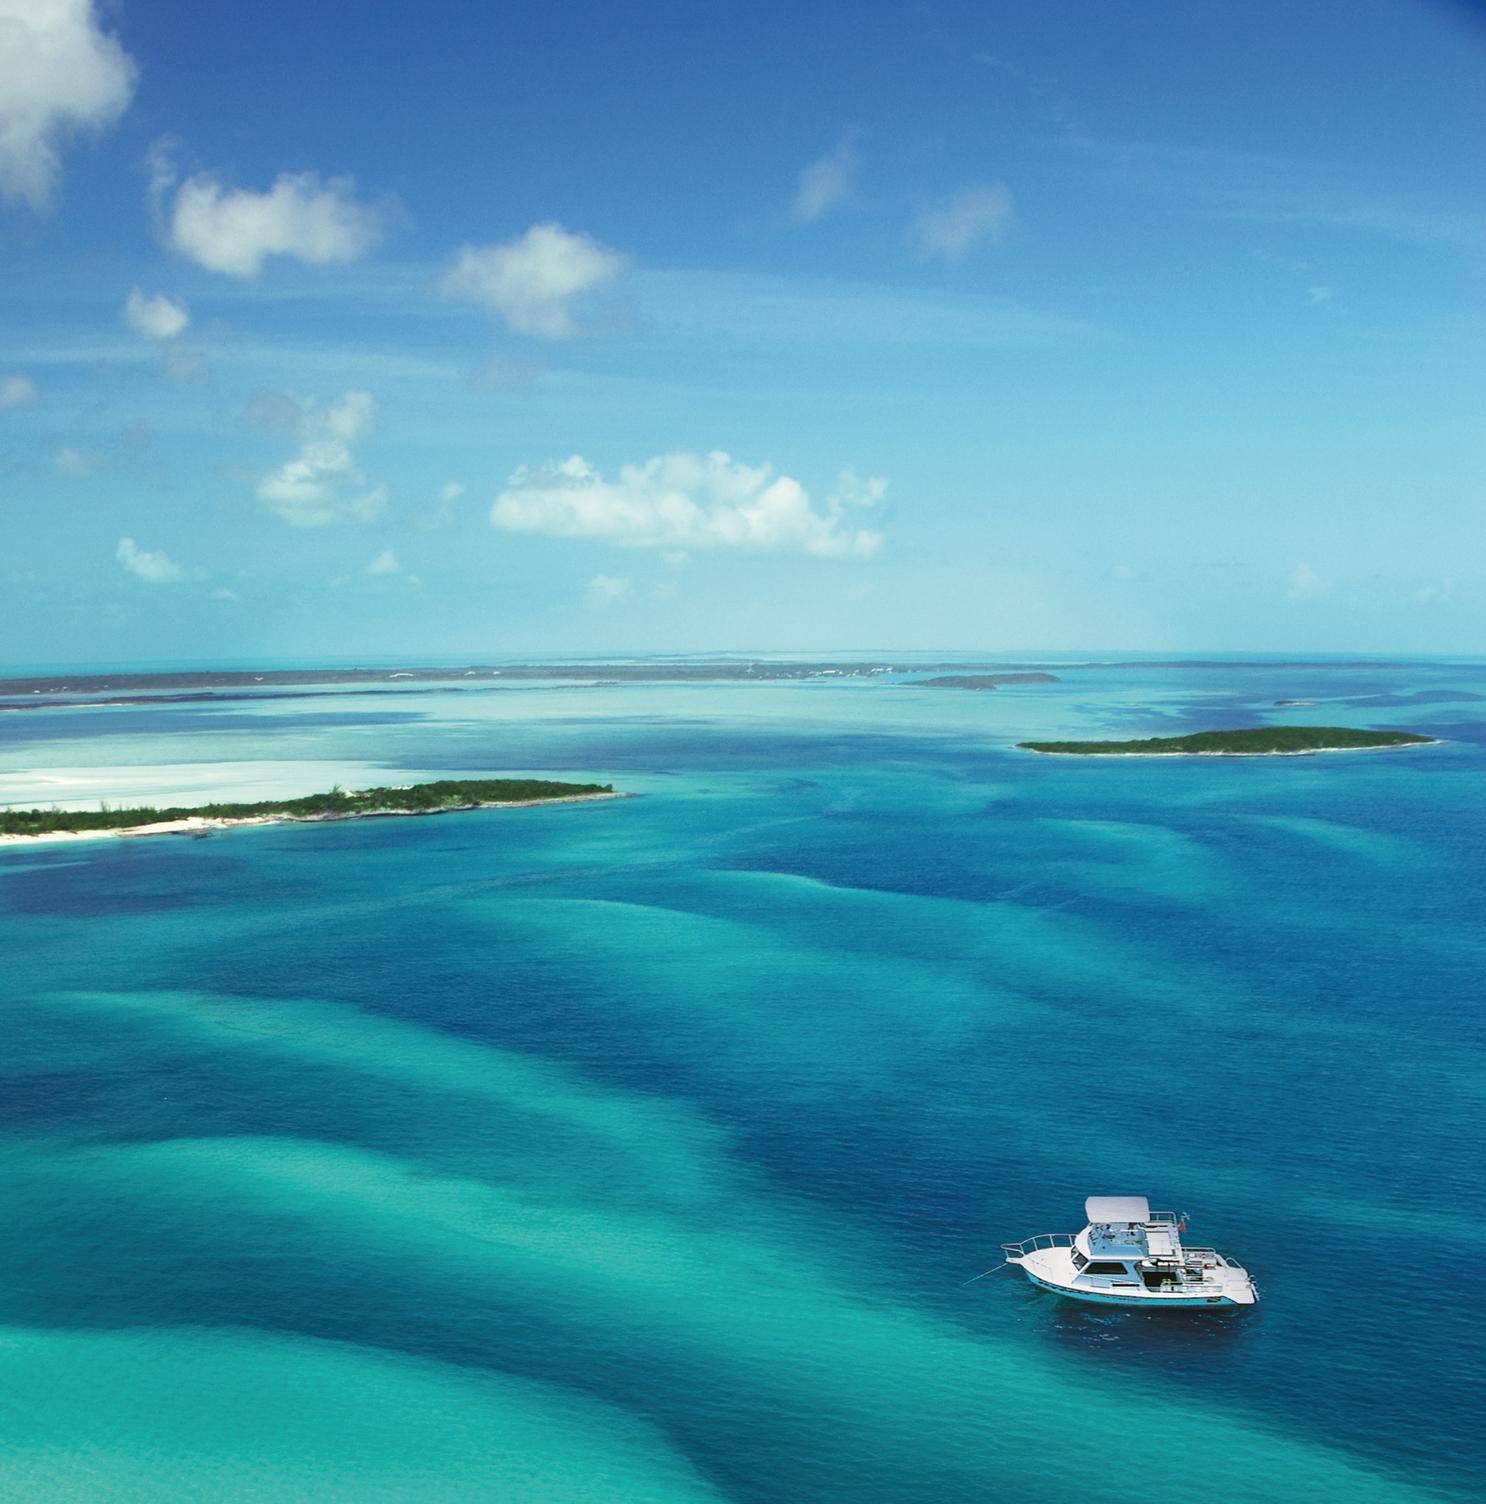 Beaches Turks & Caicos (Family Friendly)